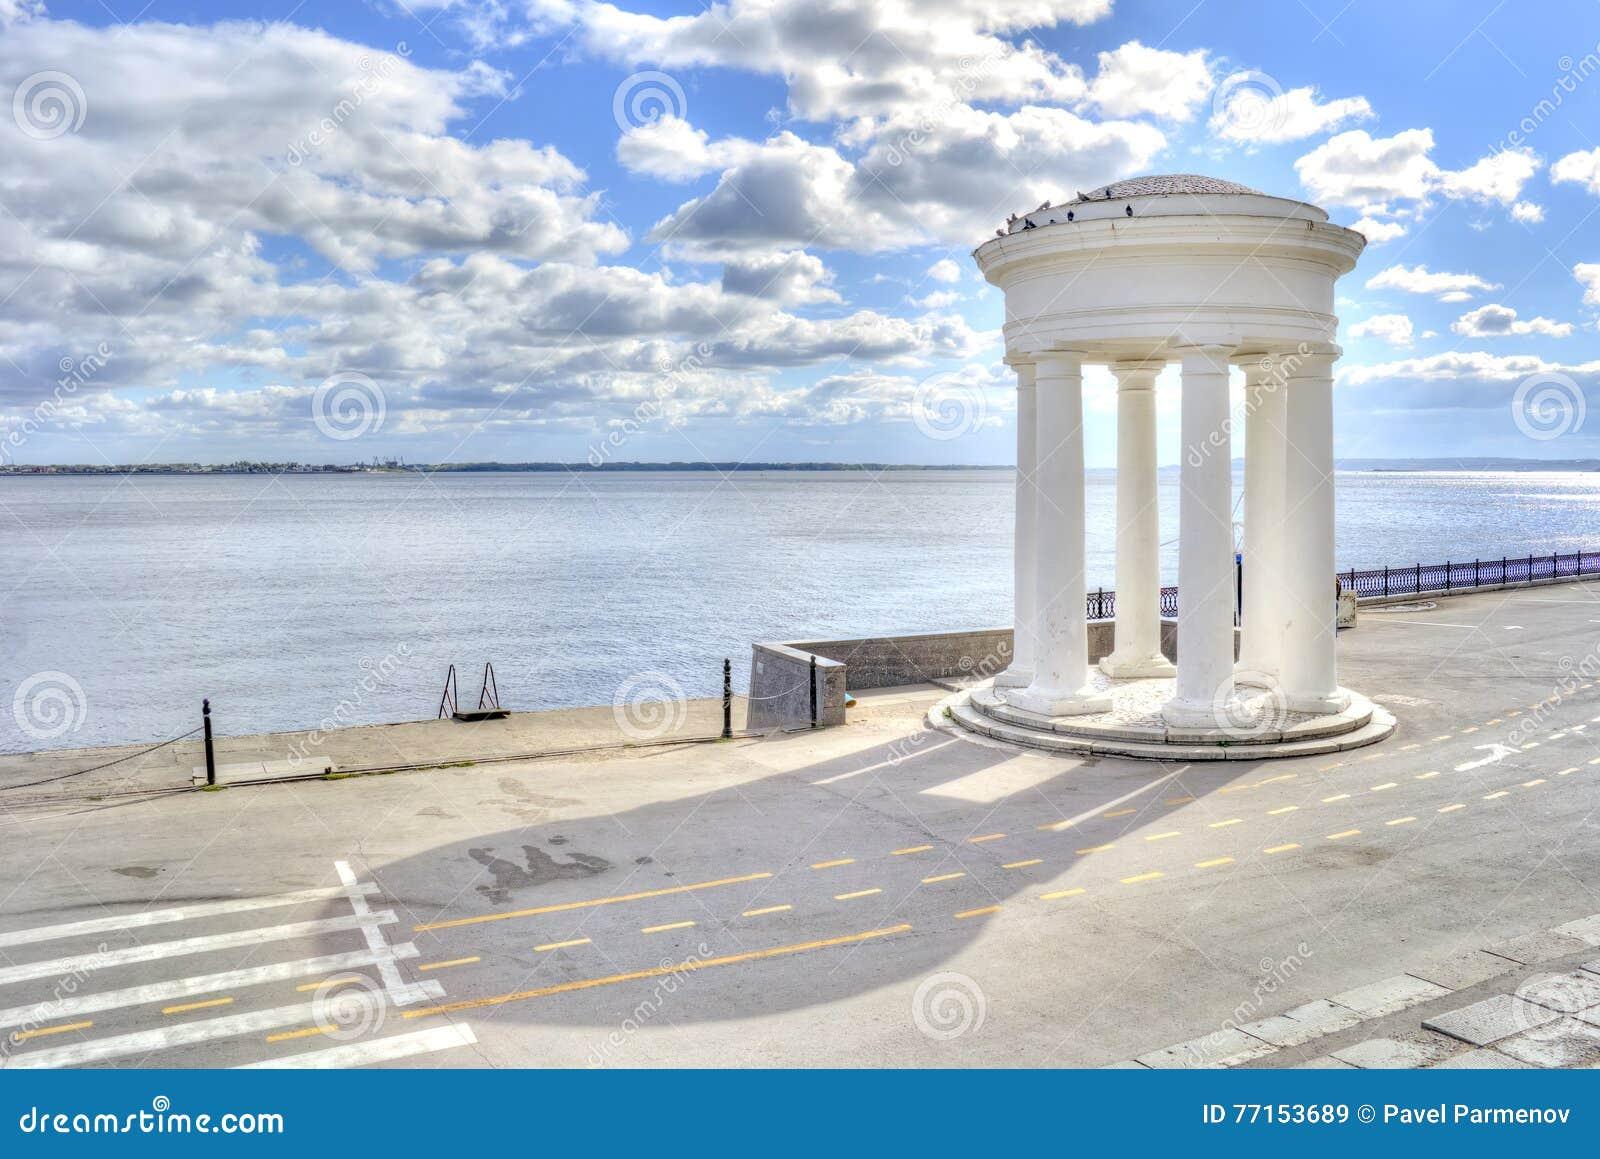 Saratov Rotunda à terre